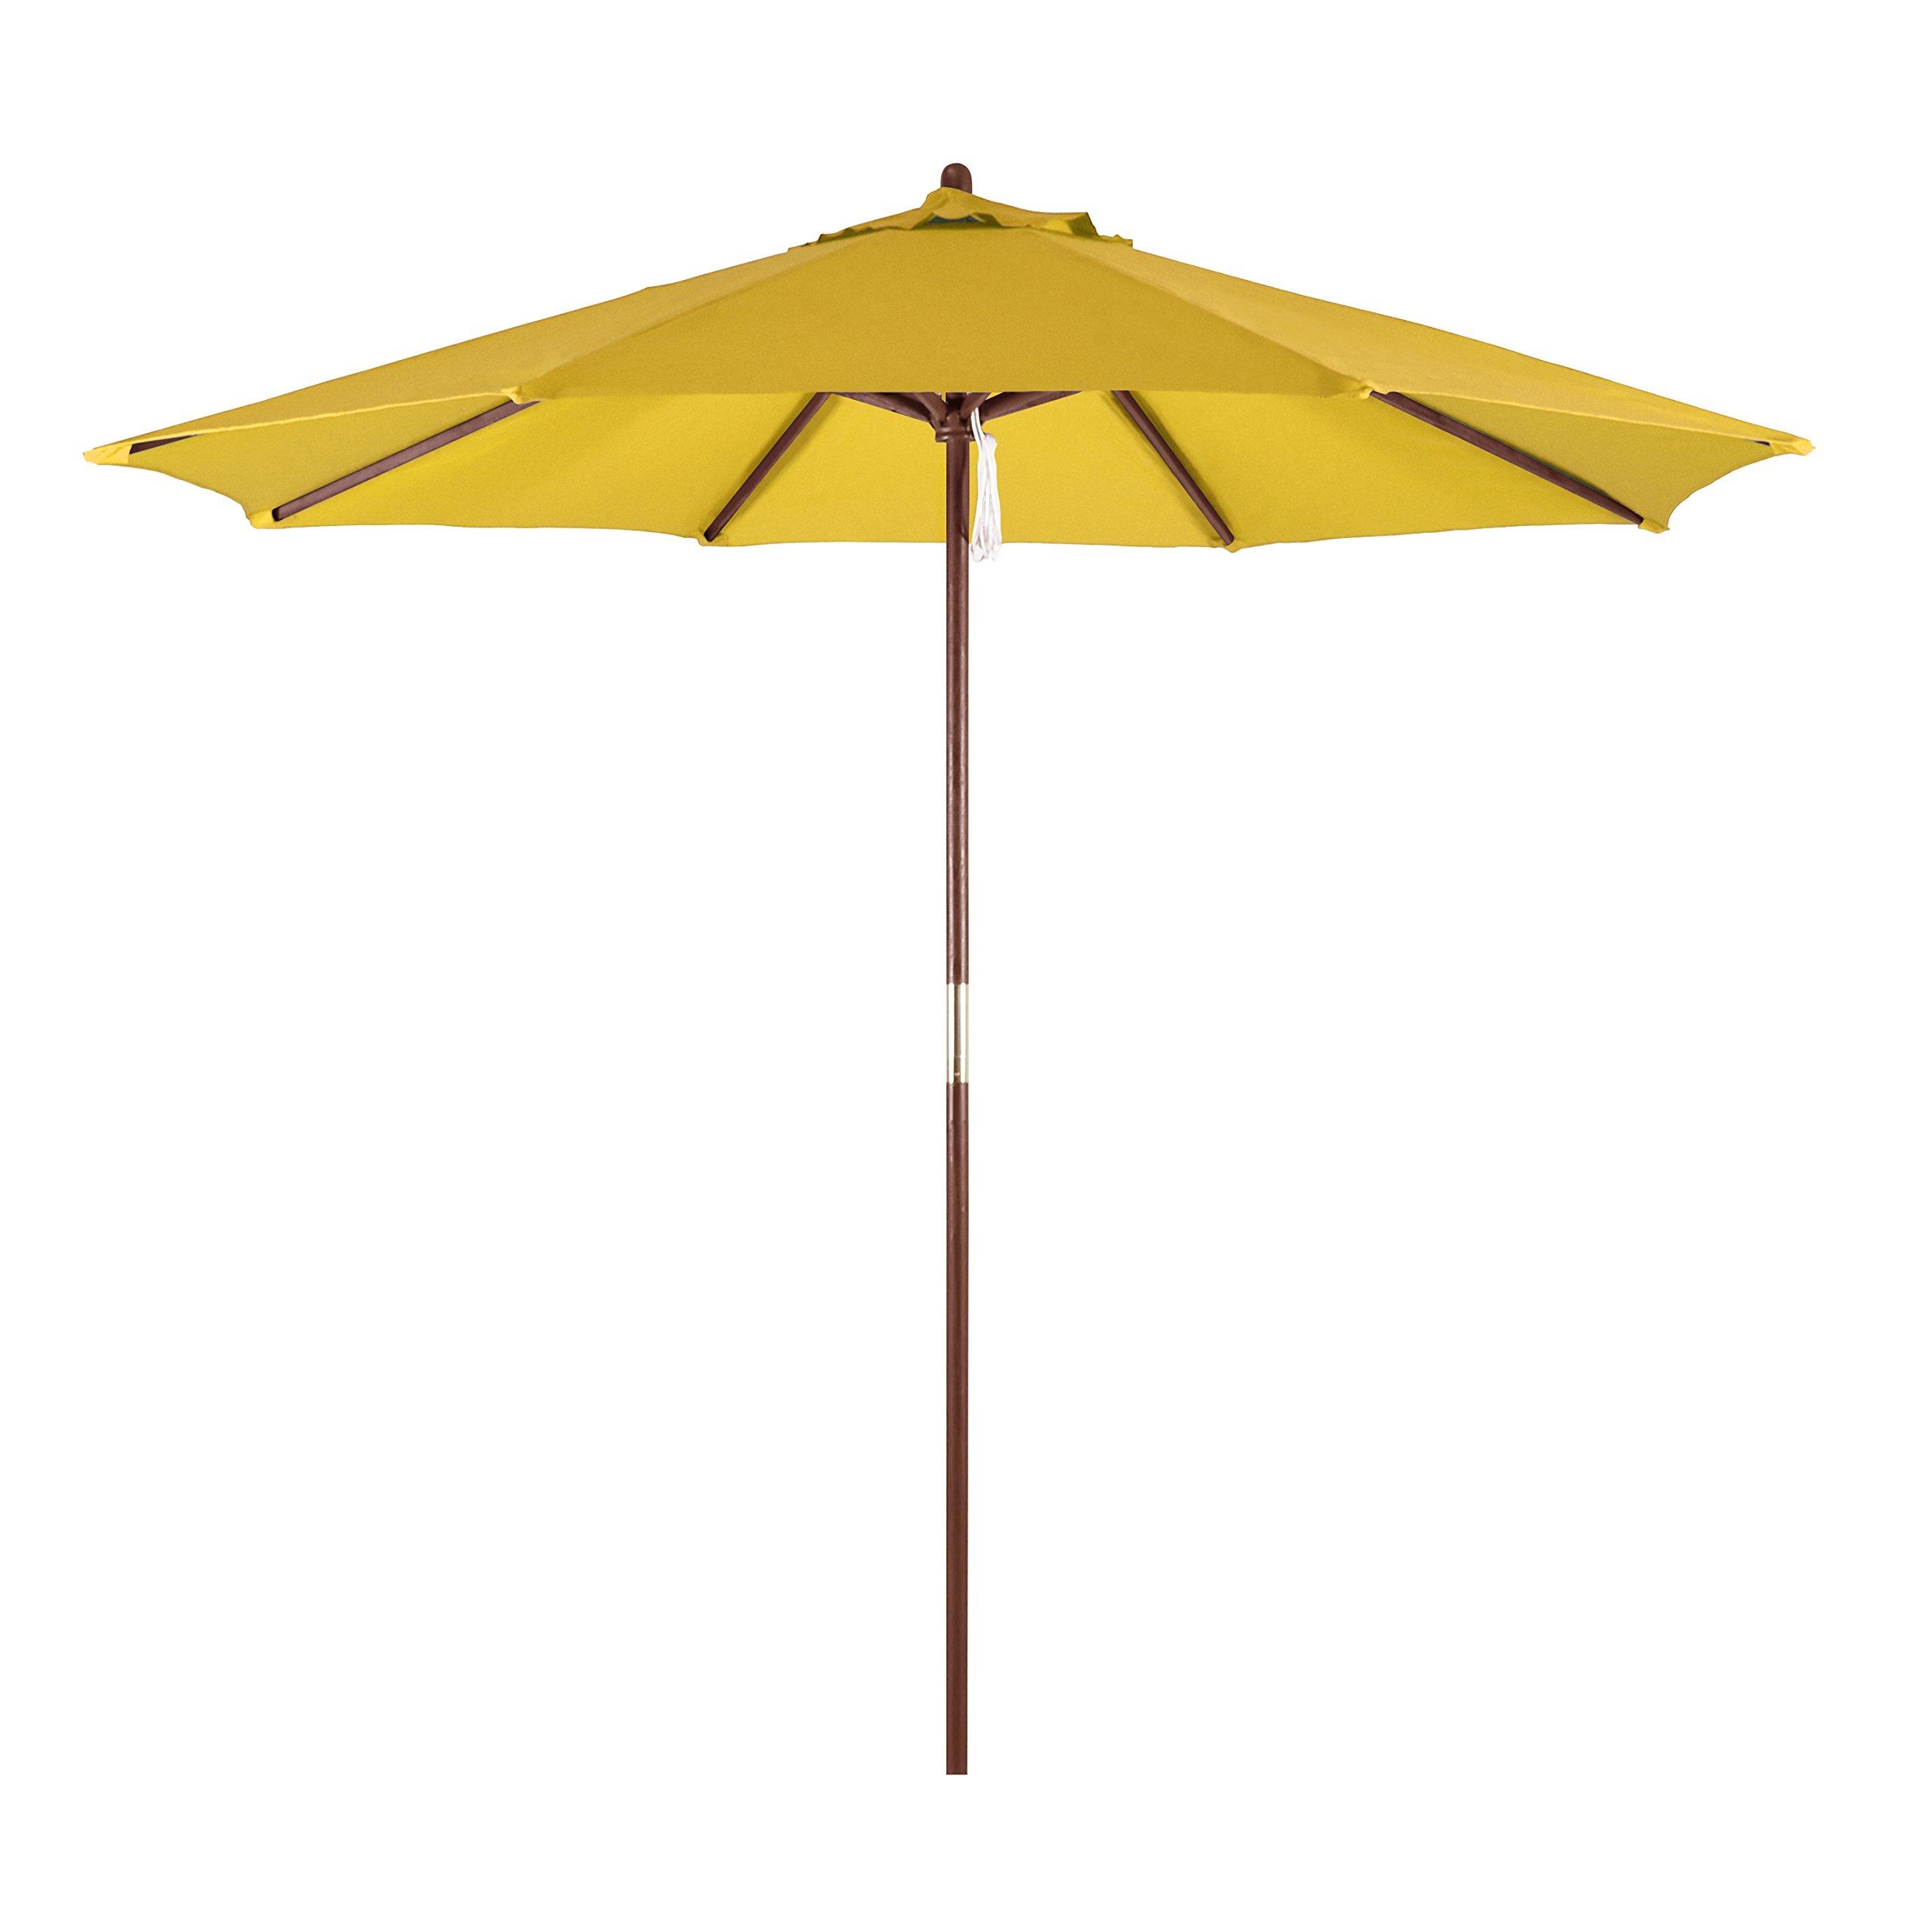 California Umbrella 9' Round Hardwood Frame Market Umbrella, Pulley Lift, Polyester Yellow